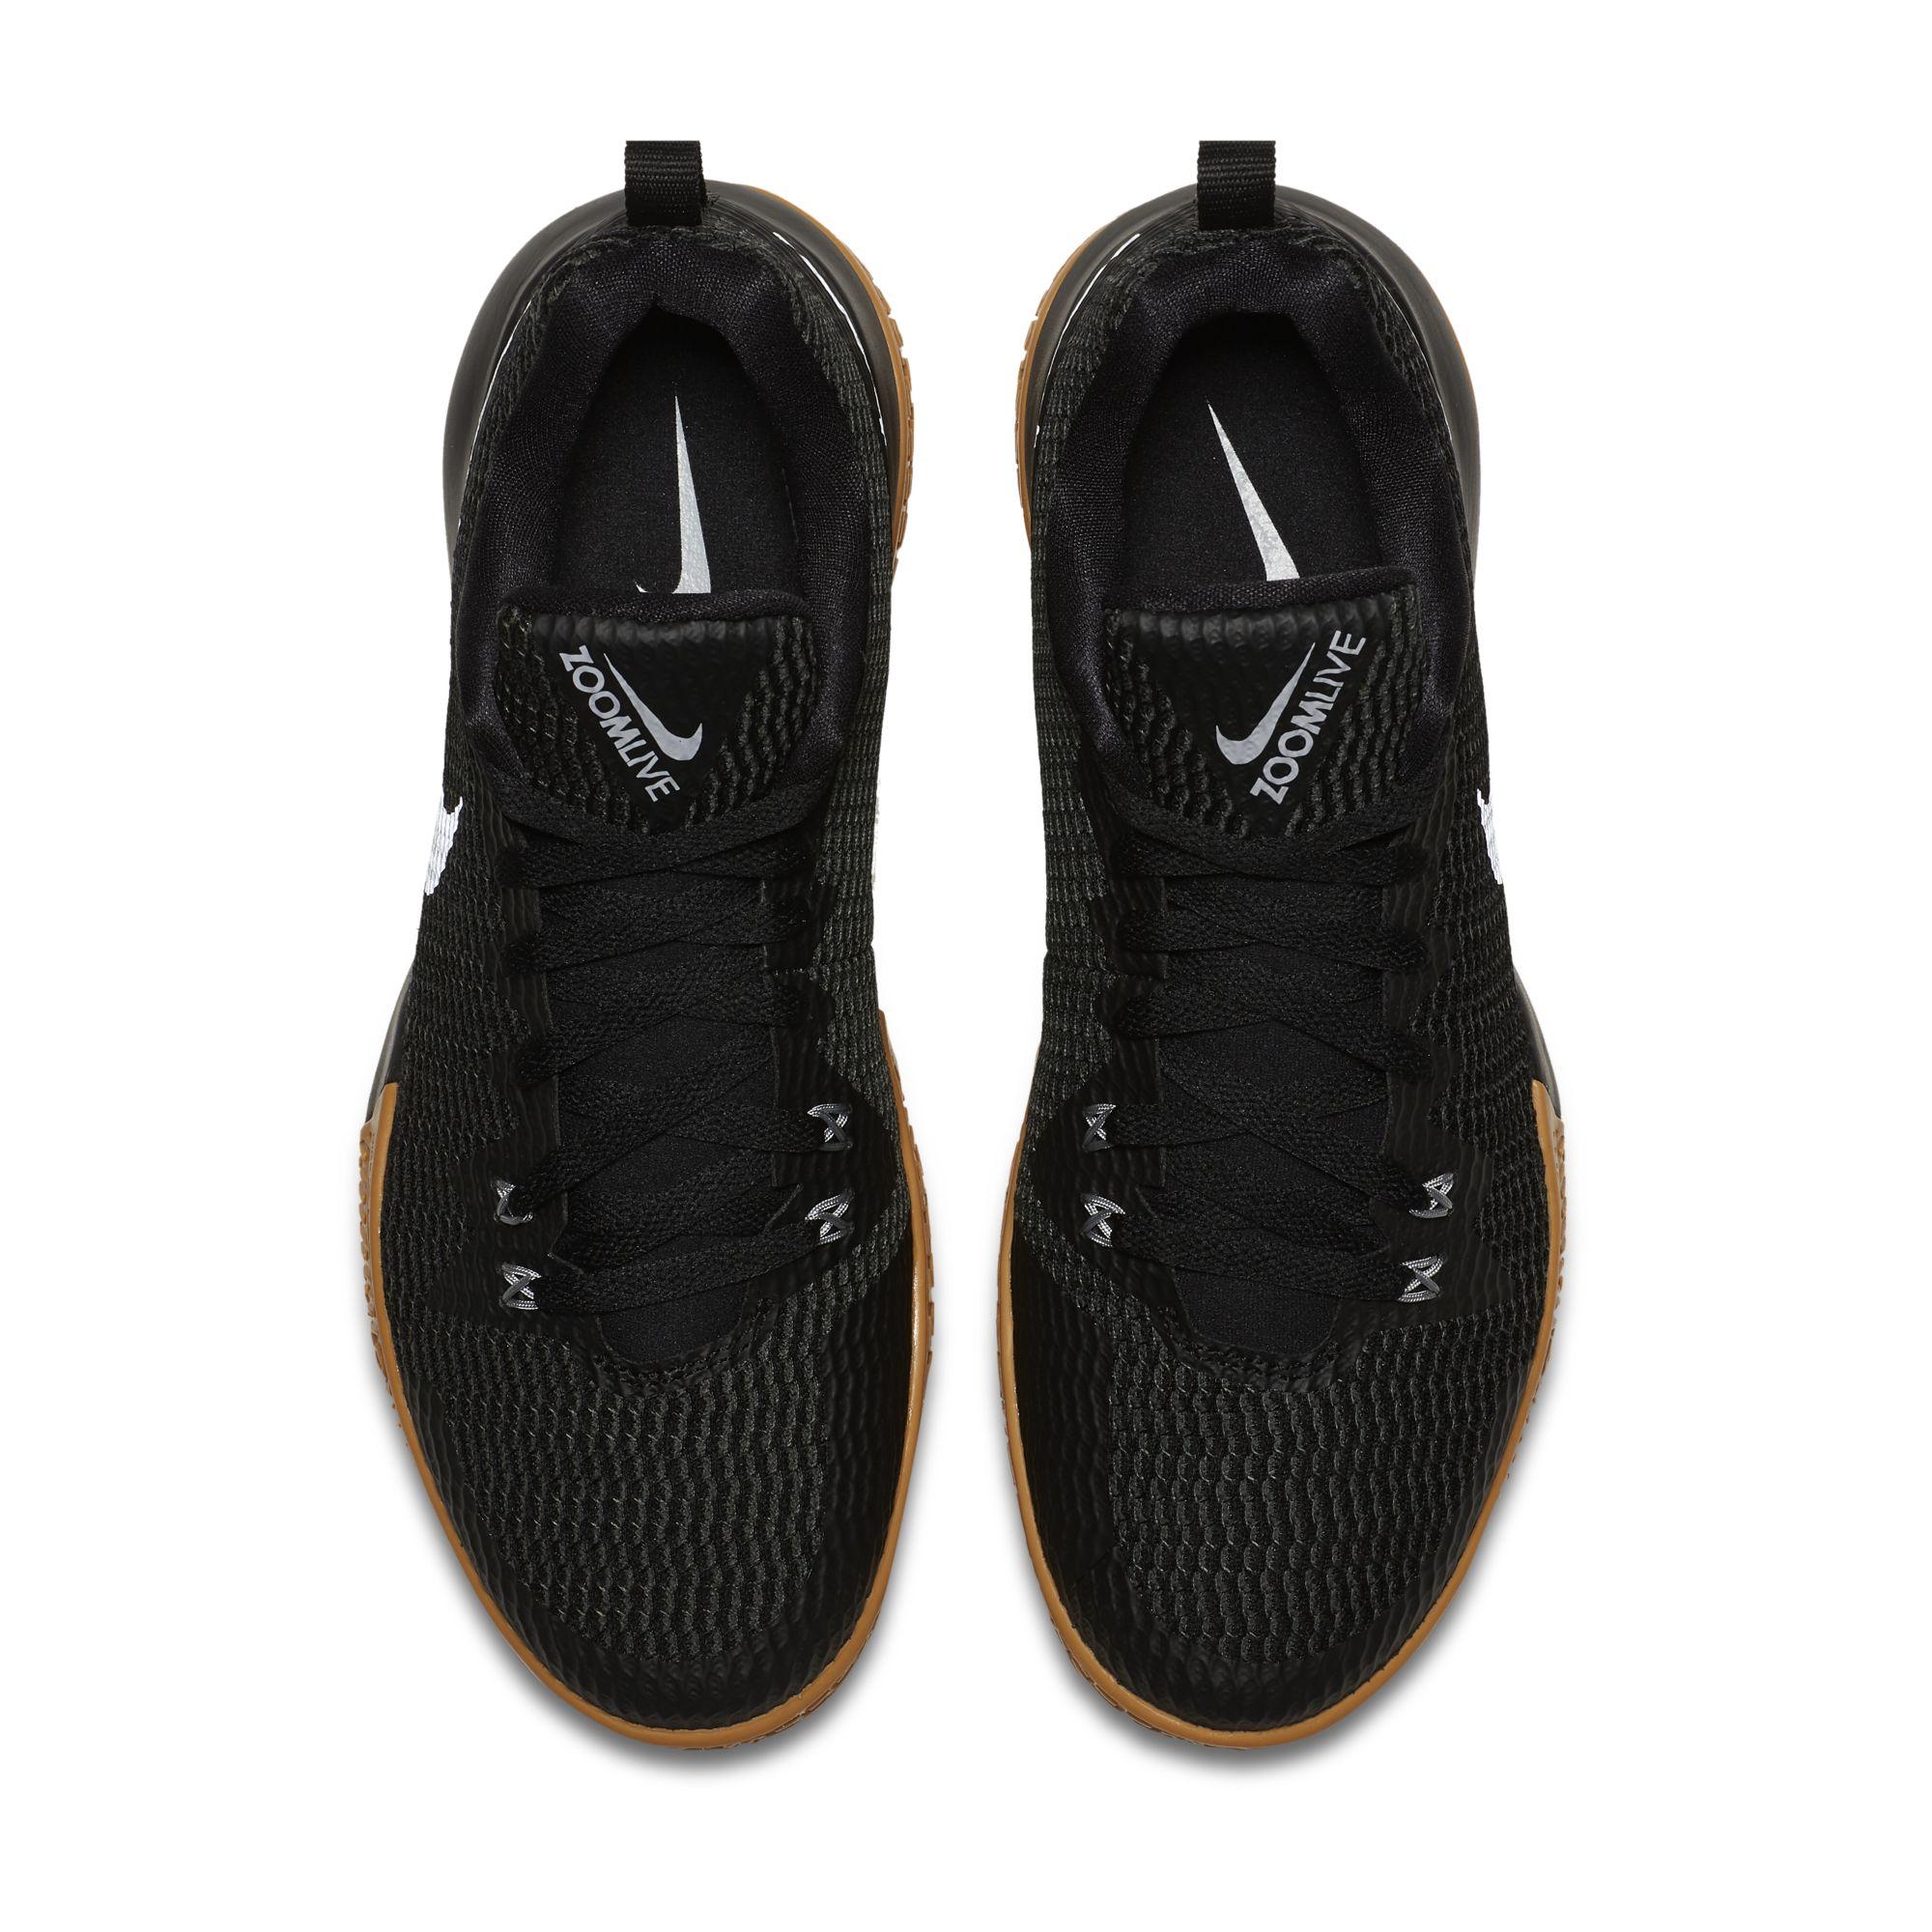 86ae0d416ffd Nike-Zoom-Live-2-Black-Gum-3 - WearTesters